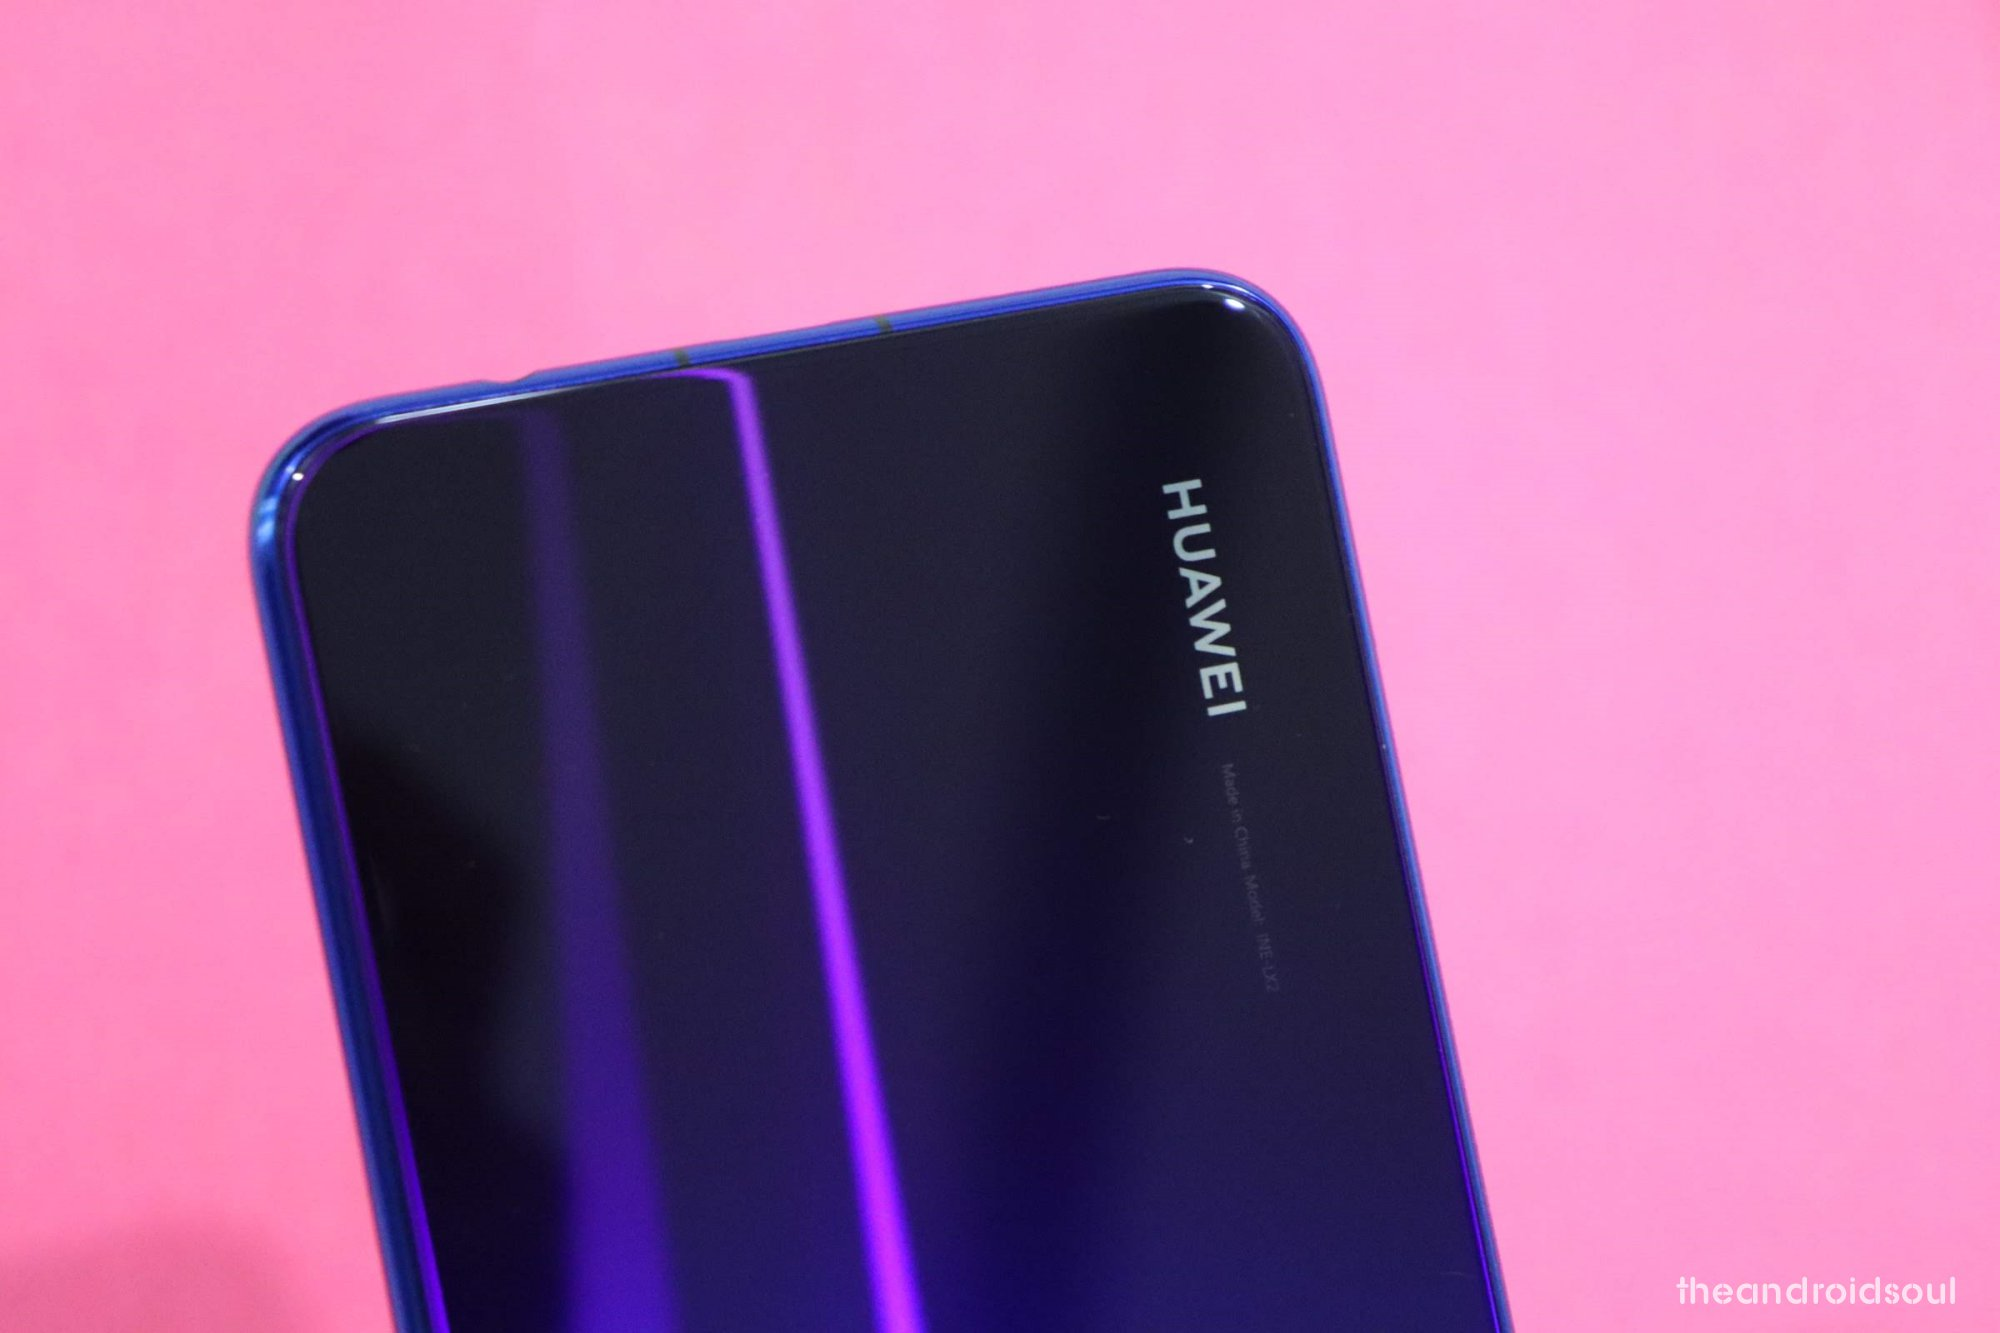 Huawei Arabia: Android 9 Pie-based EMUI 9 0 beta to release